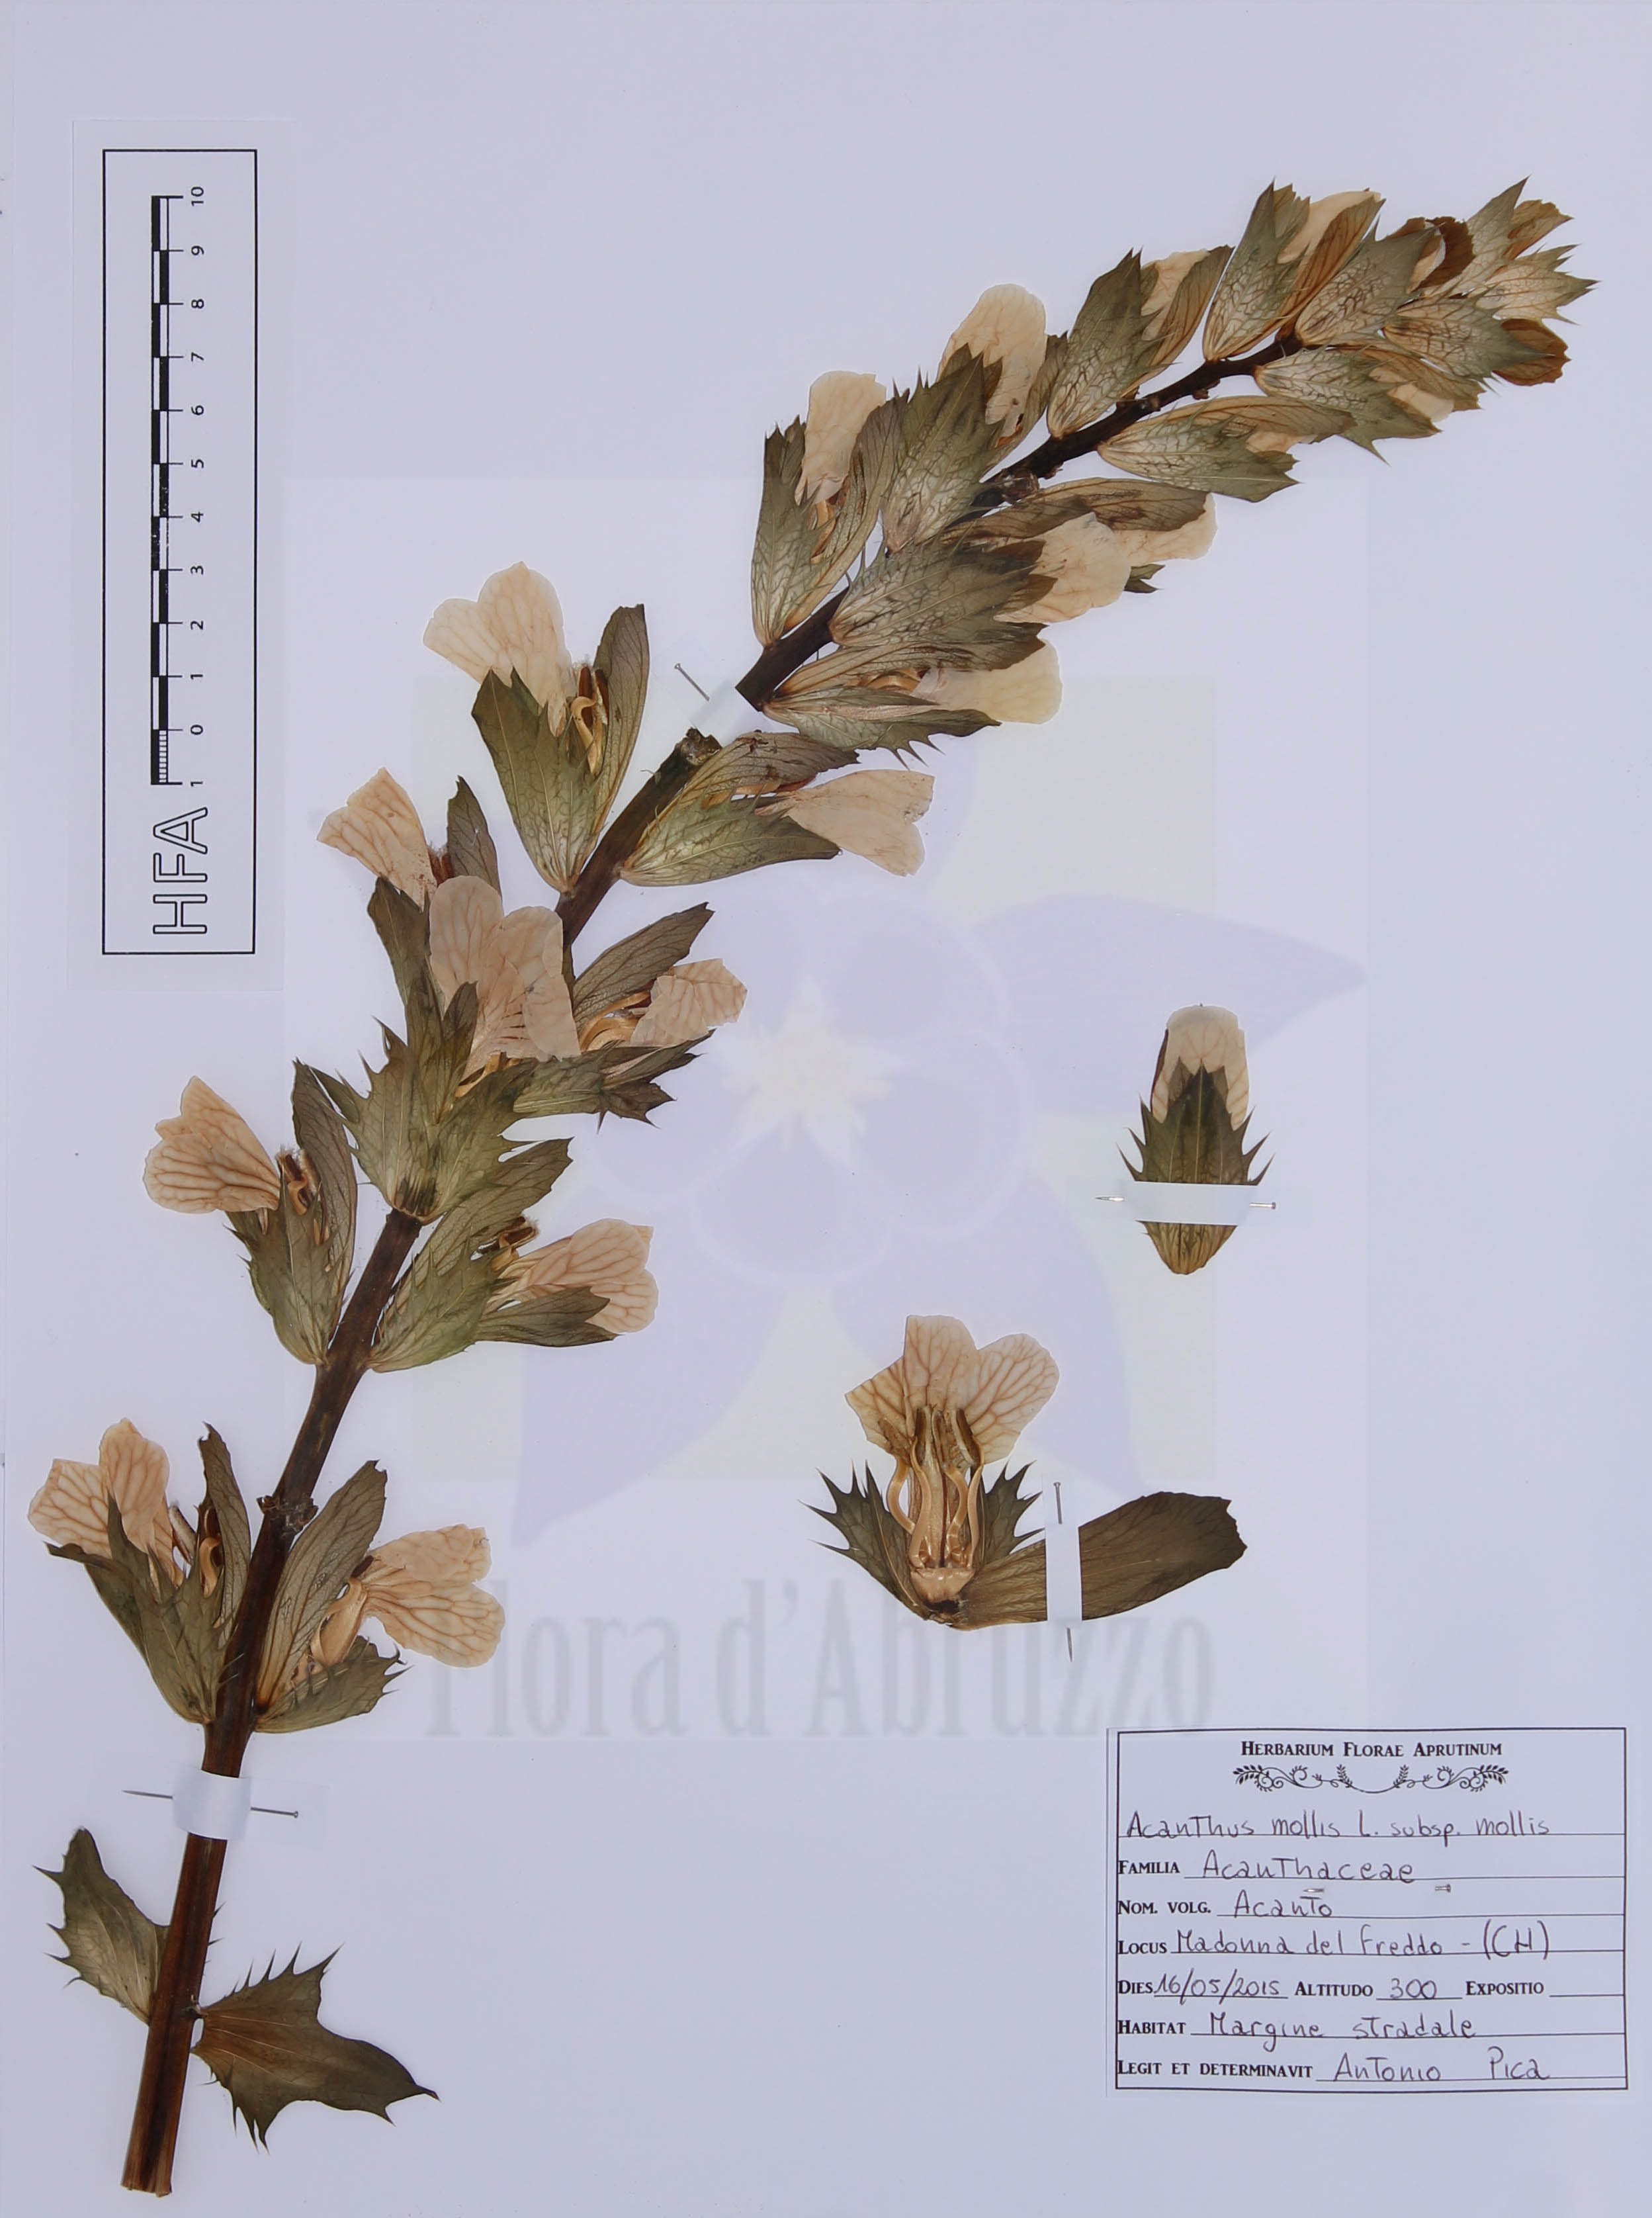 Acanthus mollis L. subsp. mollis